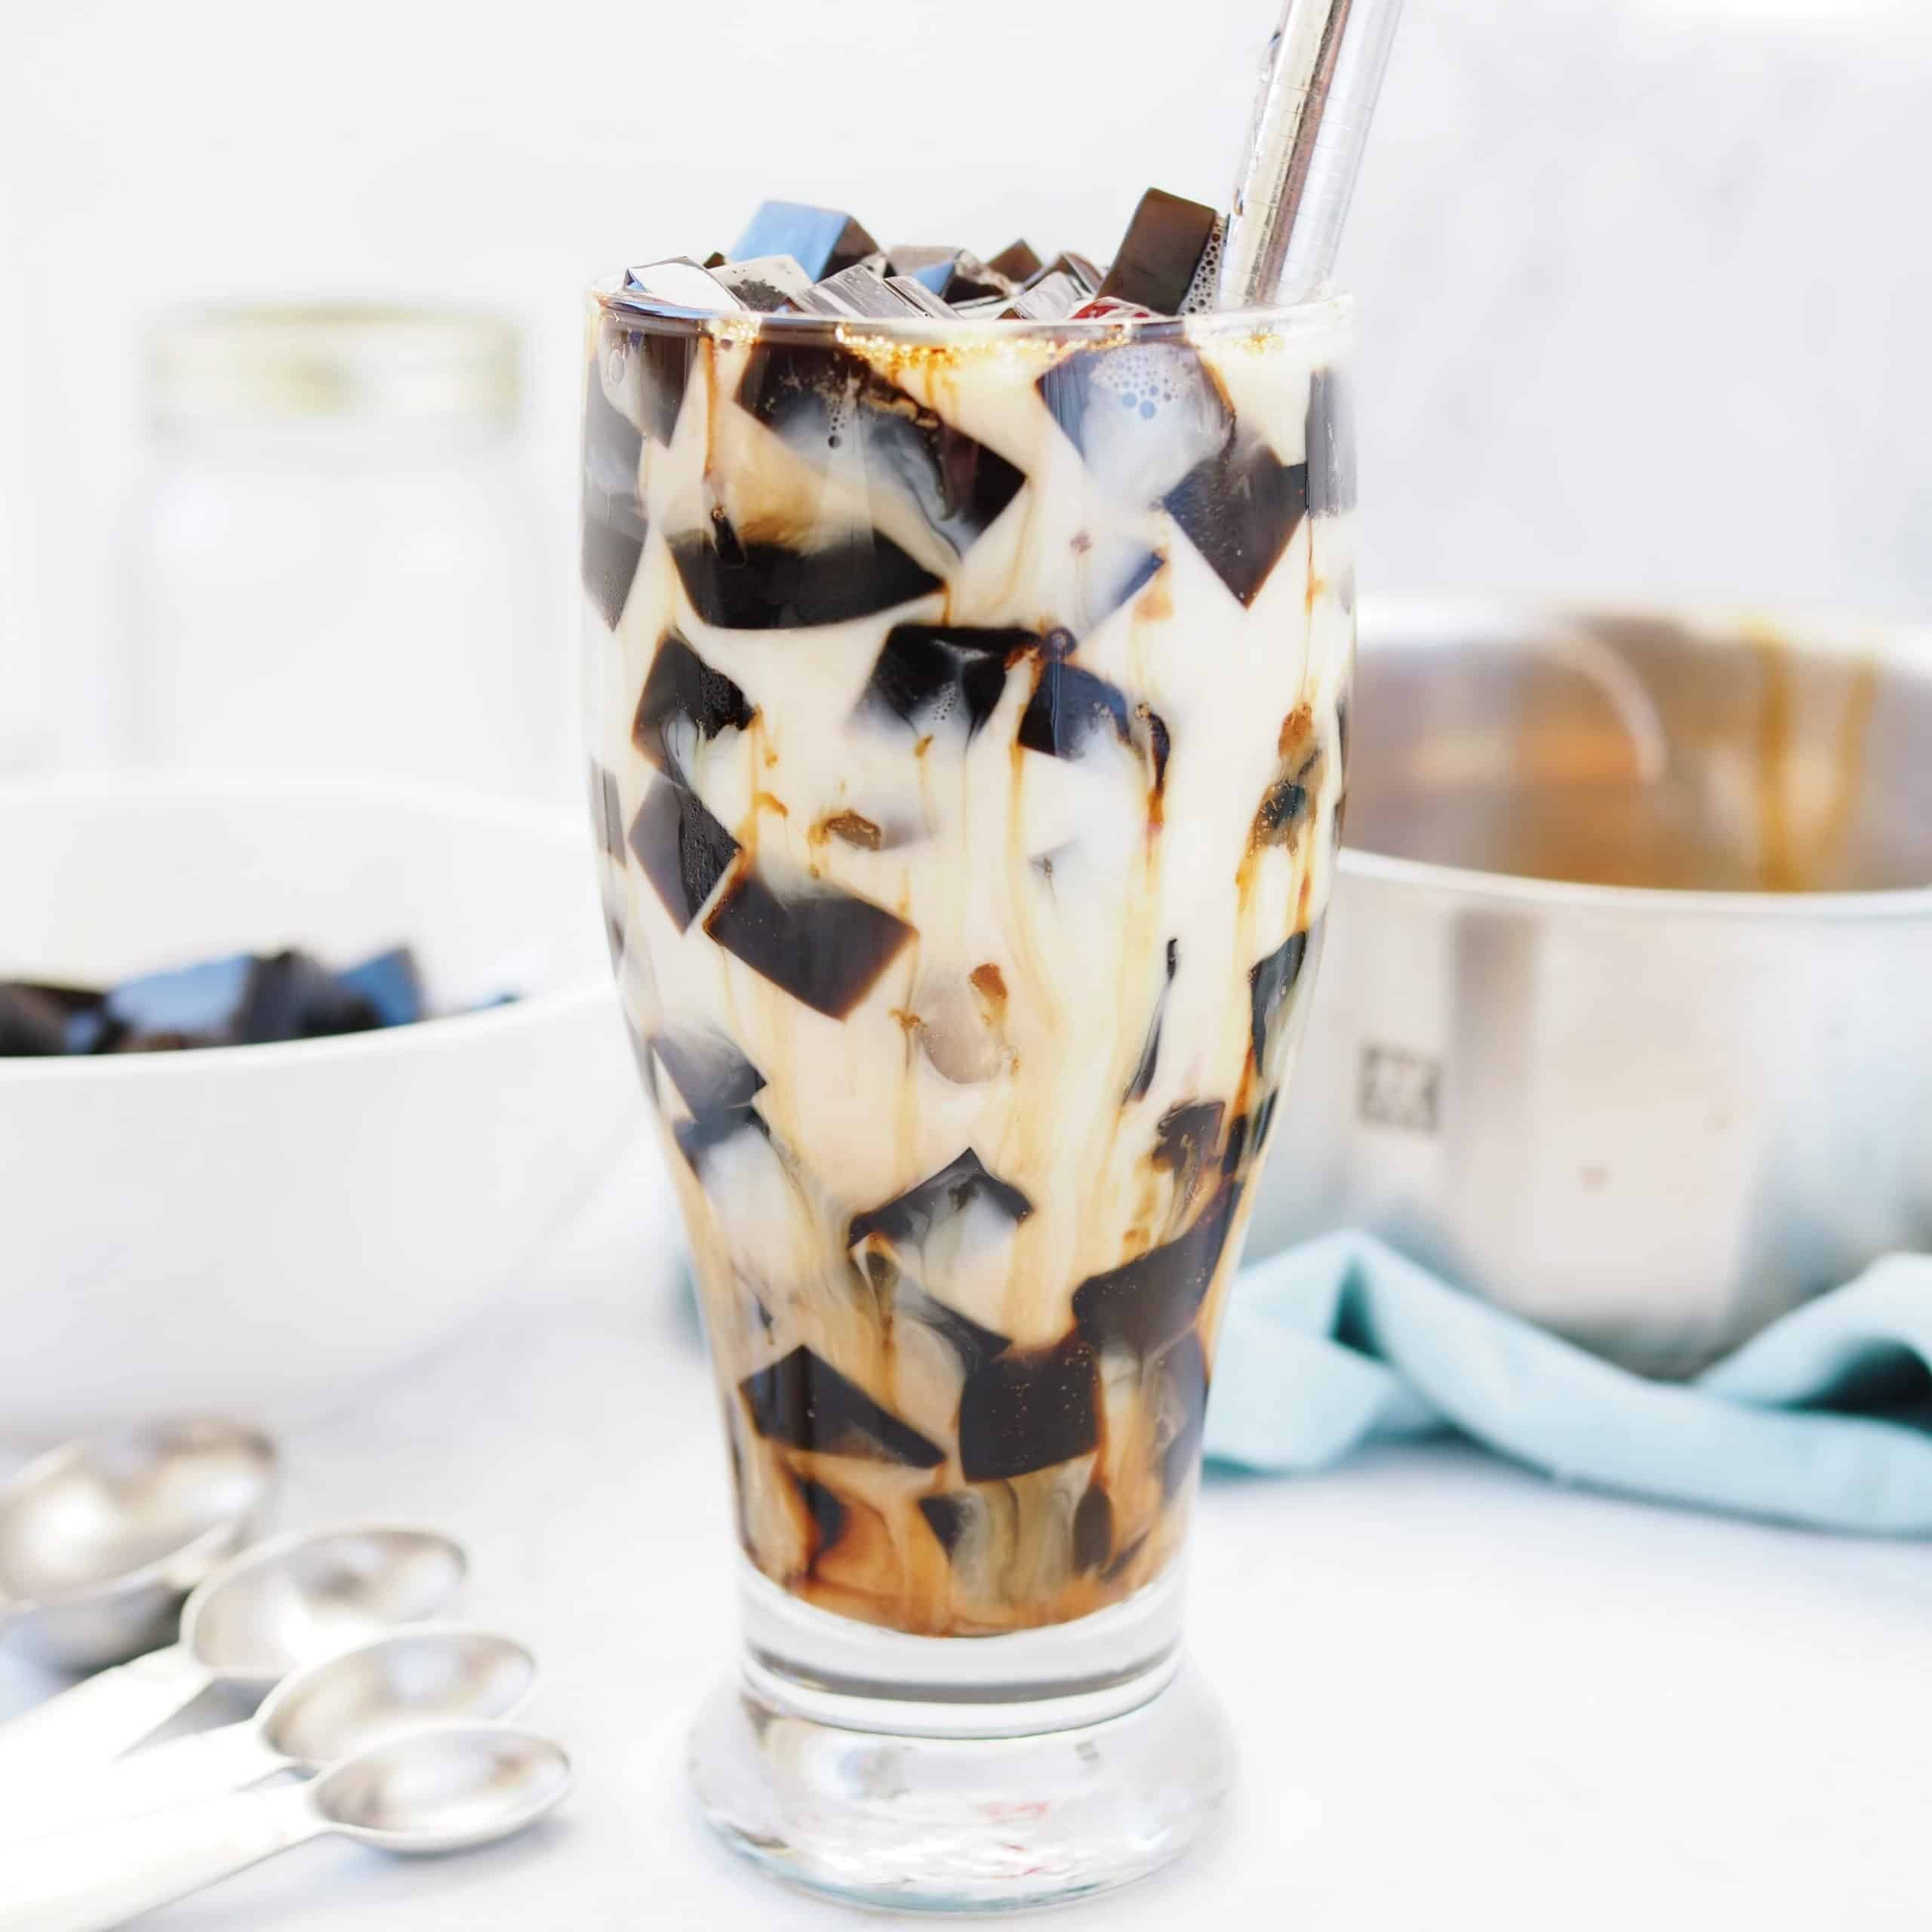 Grass Jelly Brown Sugar Milk